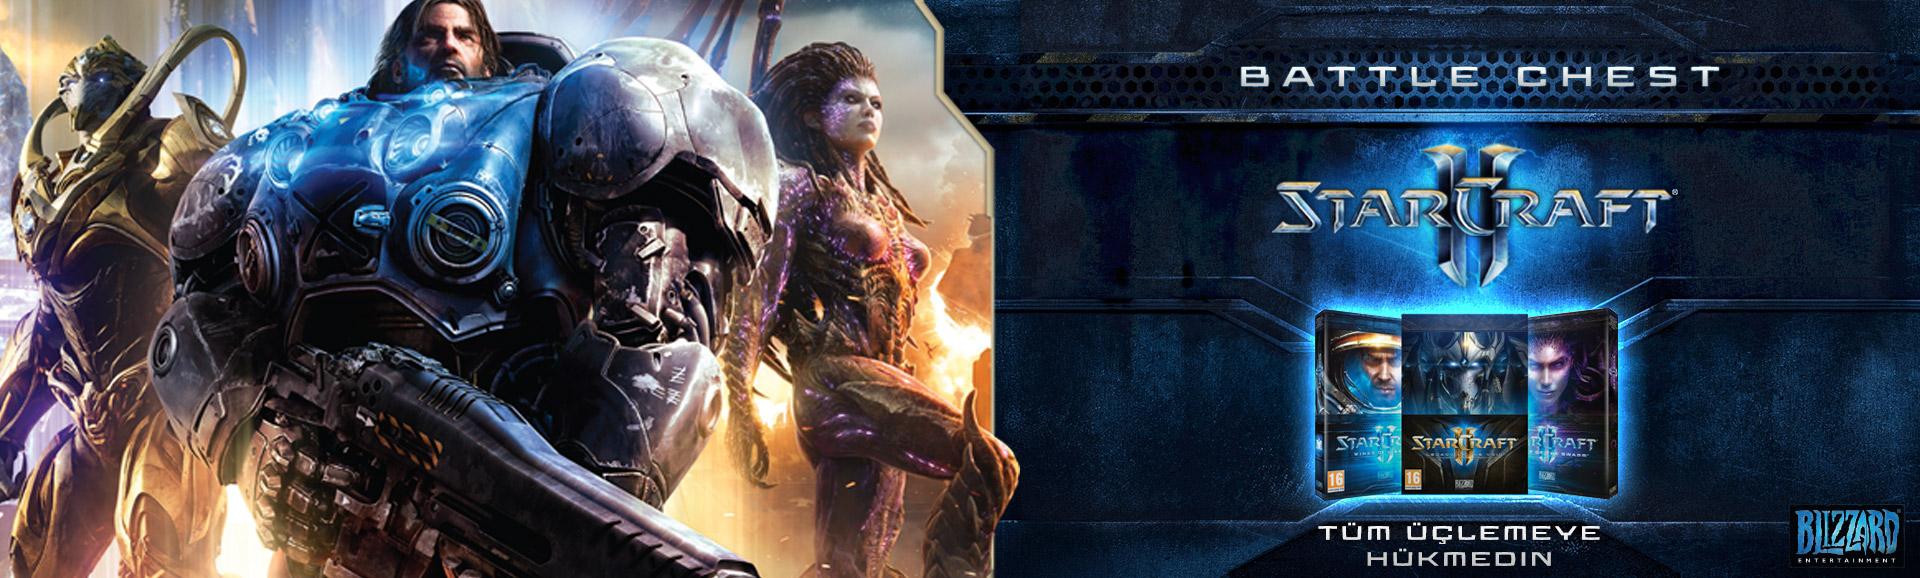 STARCRAFT 2 New BattleChest Şimdi Satışta!